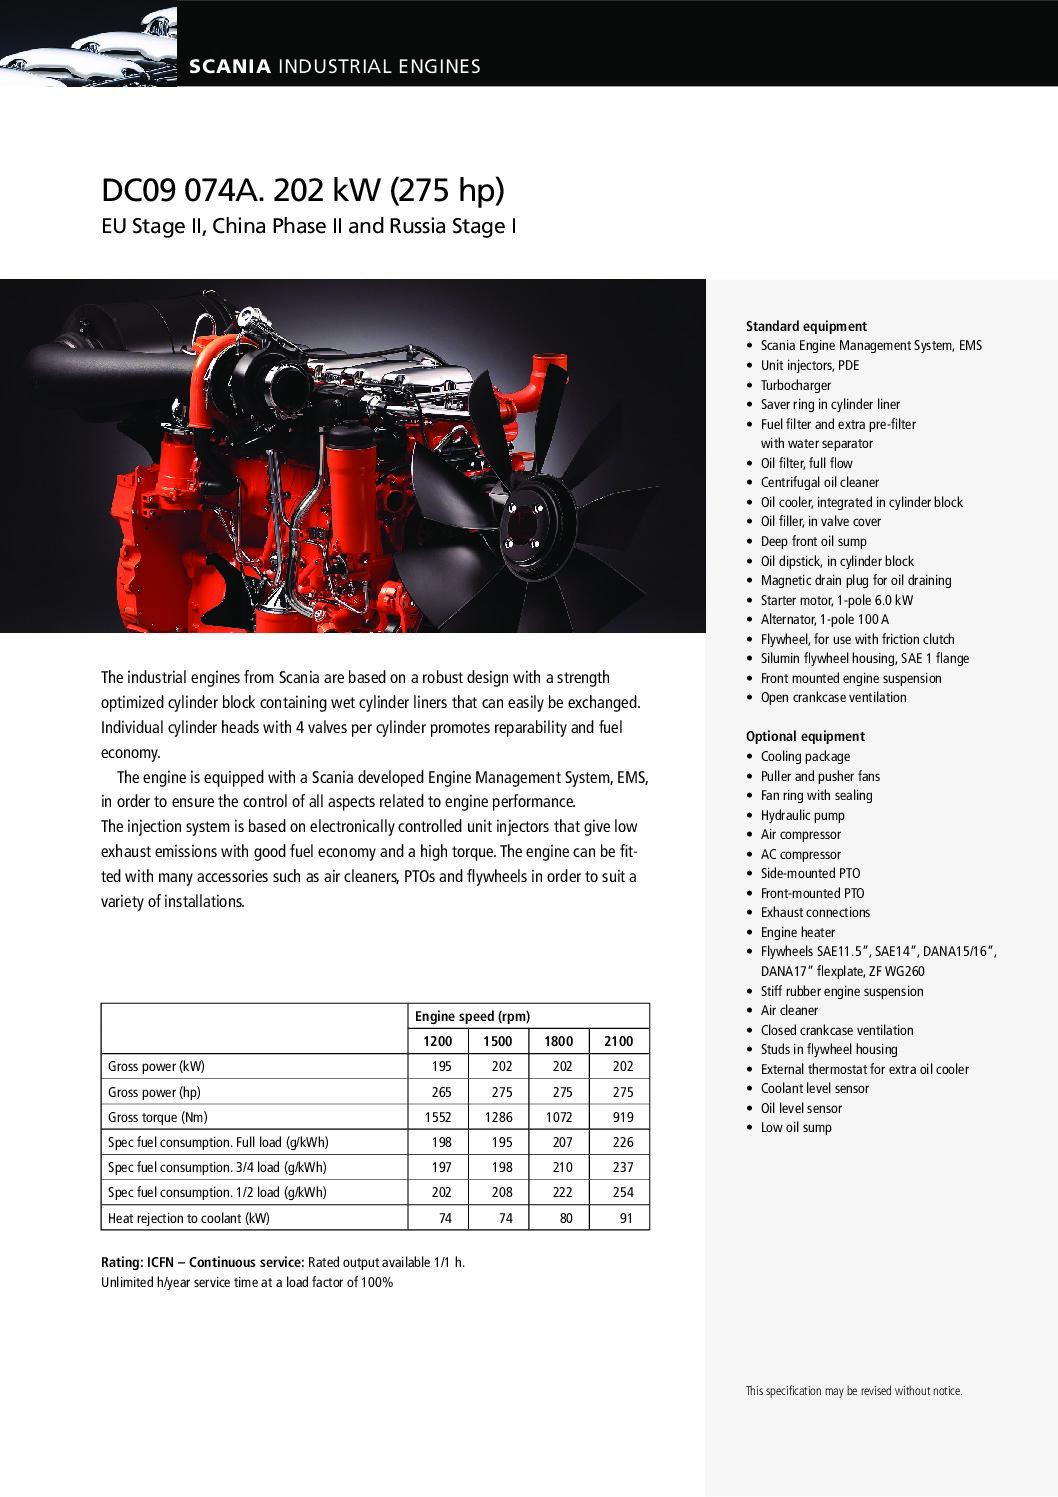 Scania datablad - industri